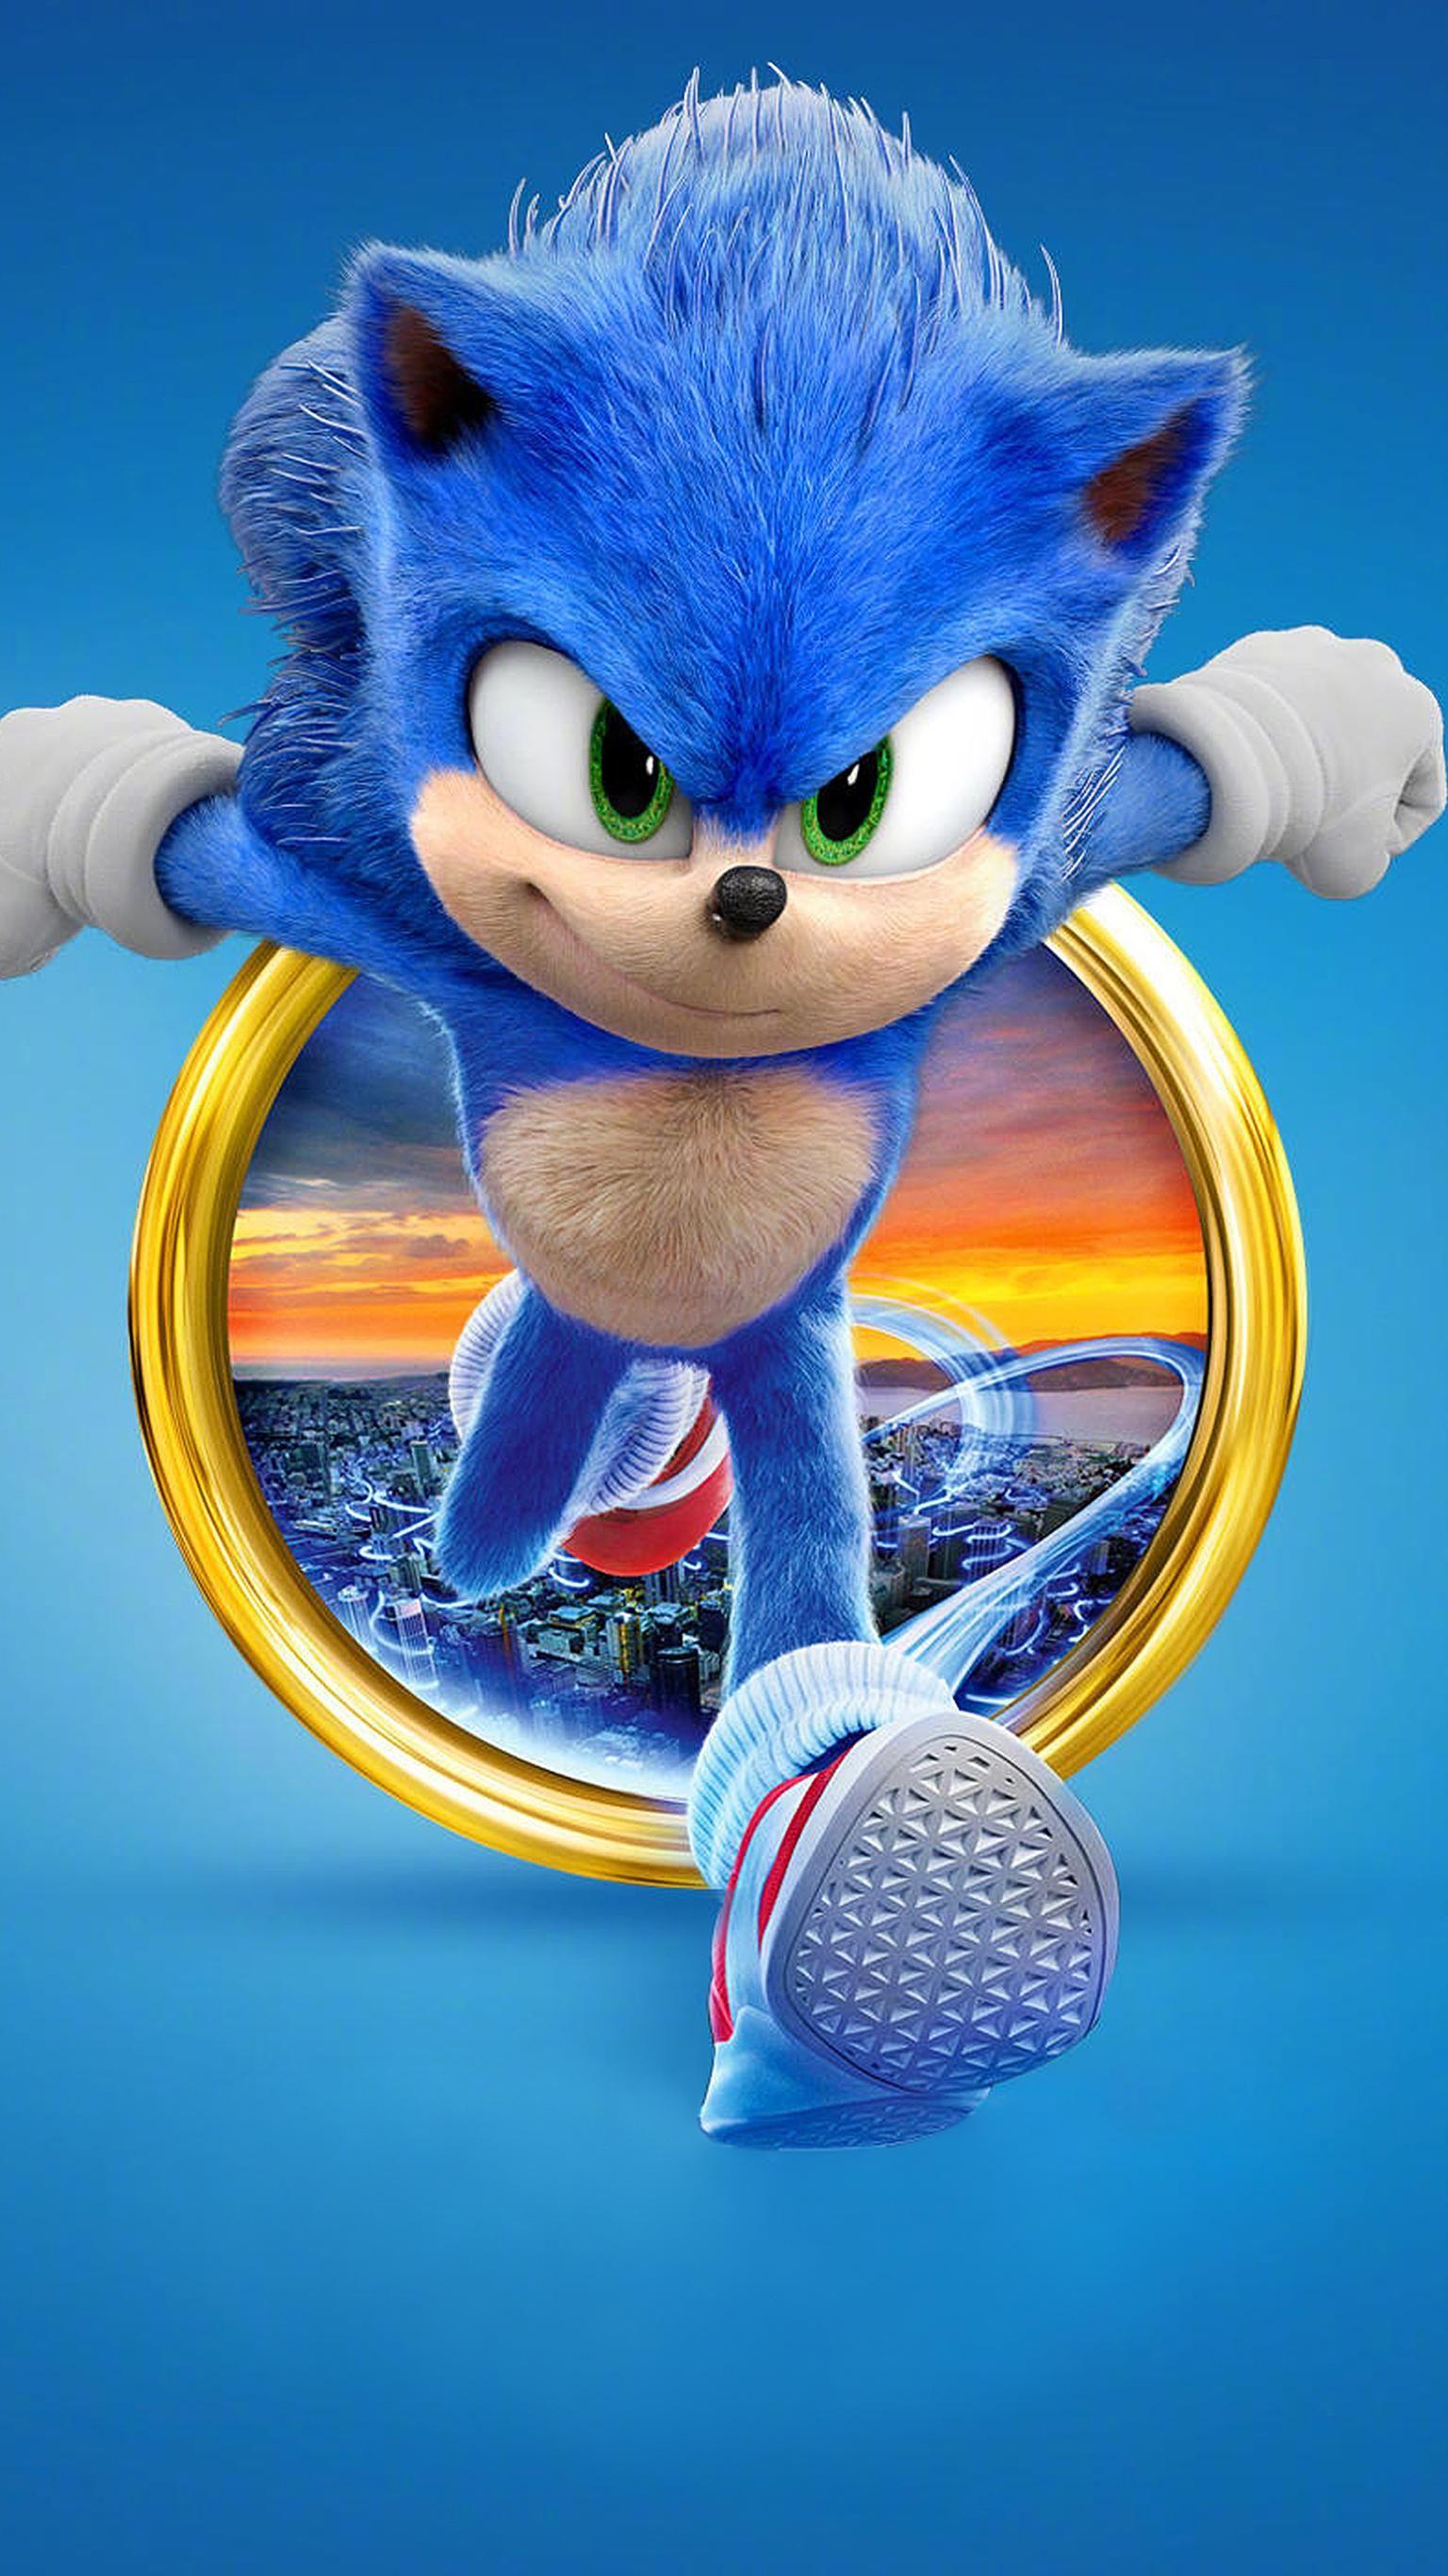 Sonic The Hedgehog 2020 Phone Wallpaper Moviemania Sonic The Hedgehog Sonic Birthday Hedgehog Movie